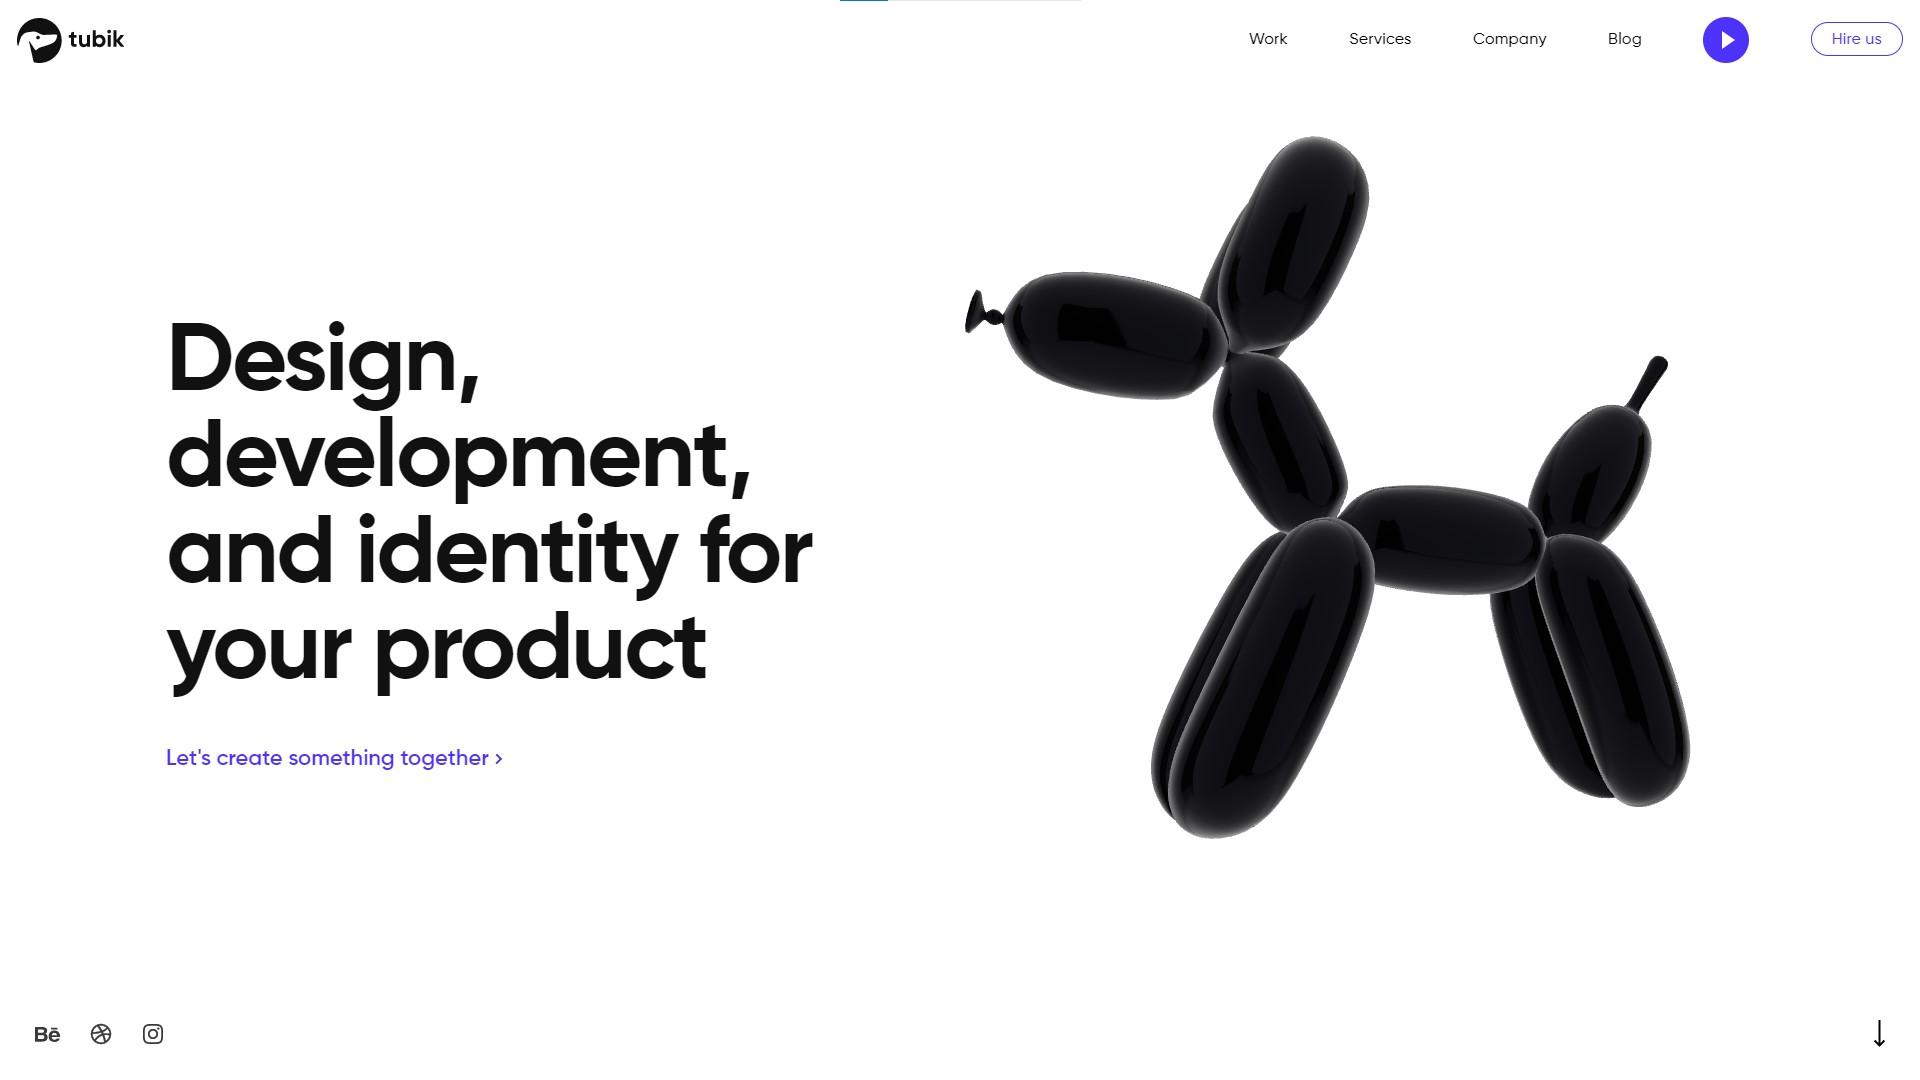 Orpetron Web Design Awards - Tubik Studio - Web Design Awards Inspiration Trends UI UX